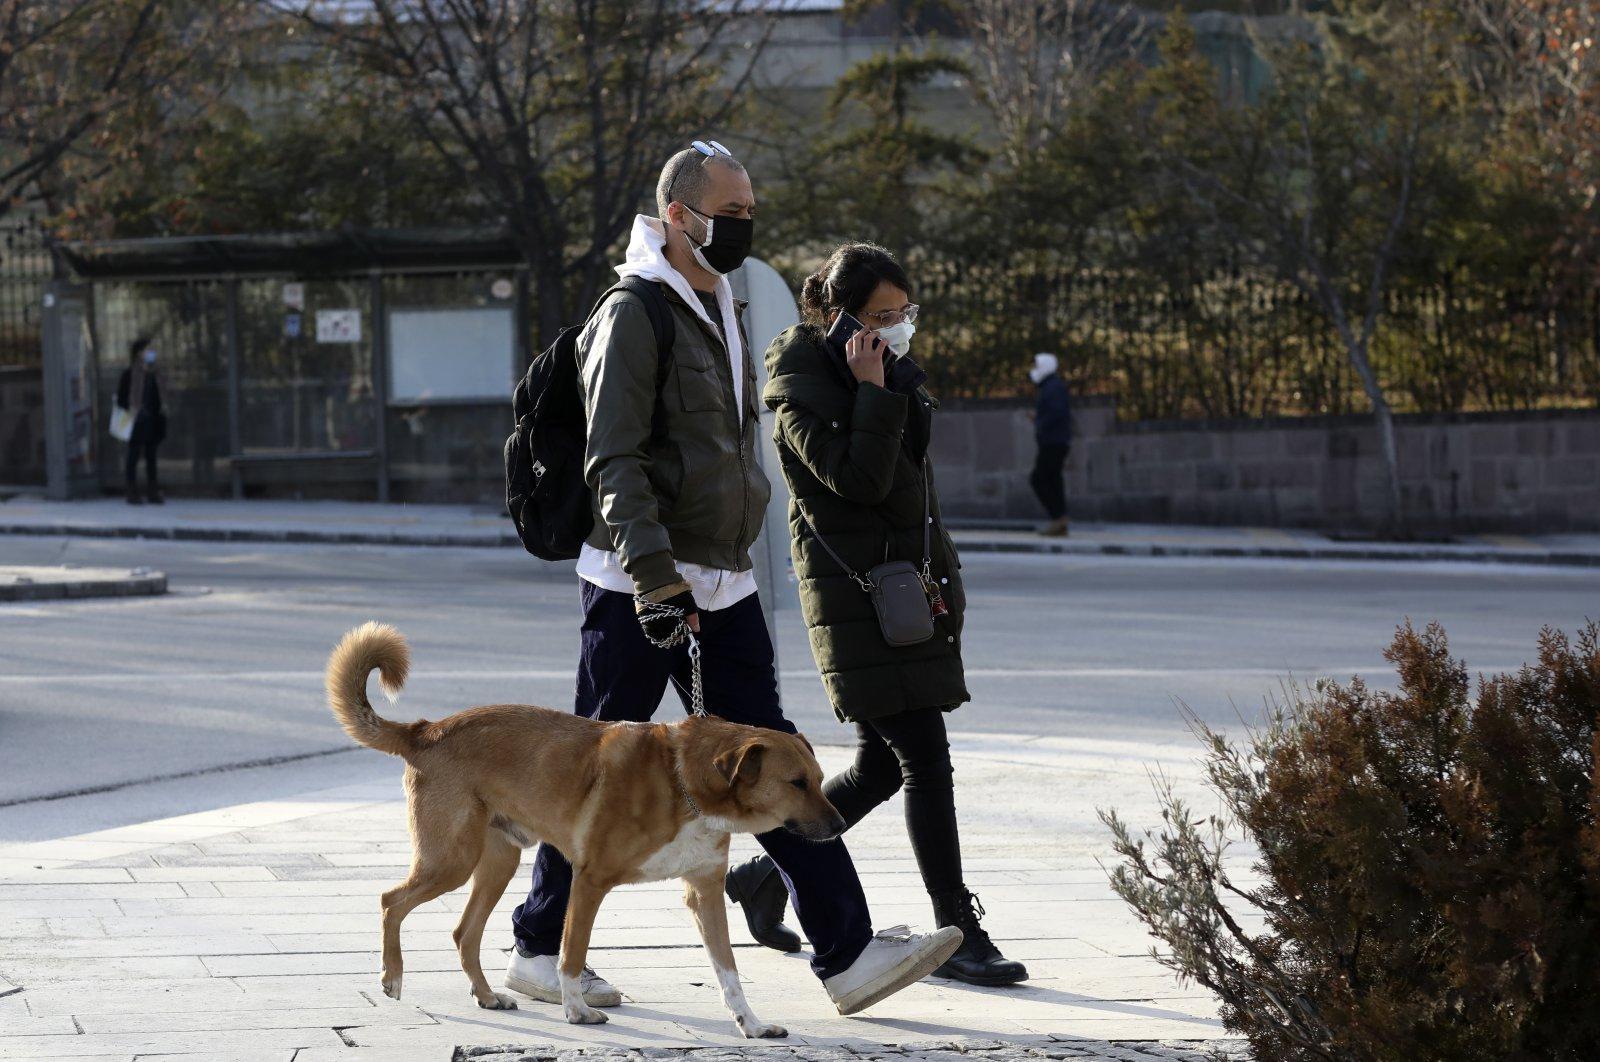 A couple wearing mask walk their dog on a street in the capital Ankara, Turkey, Jan. 22, 2021. (AP Photo)